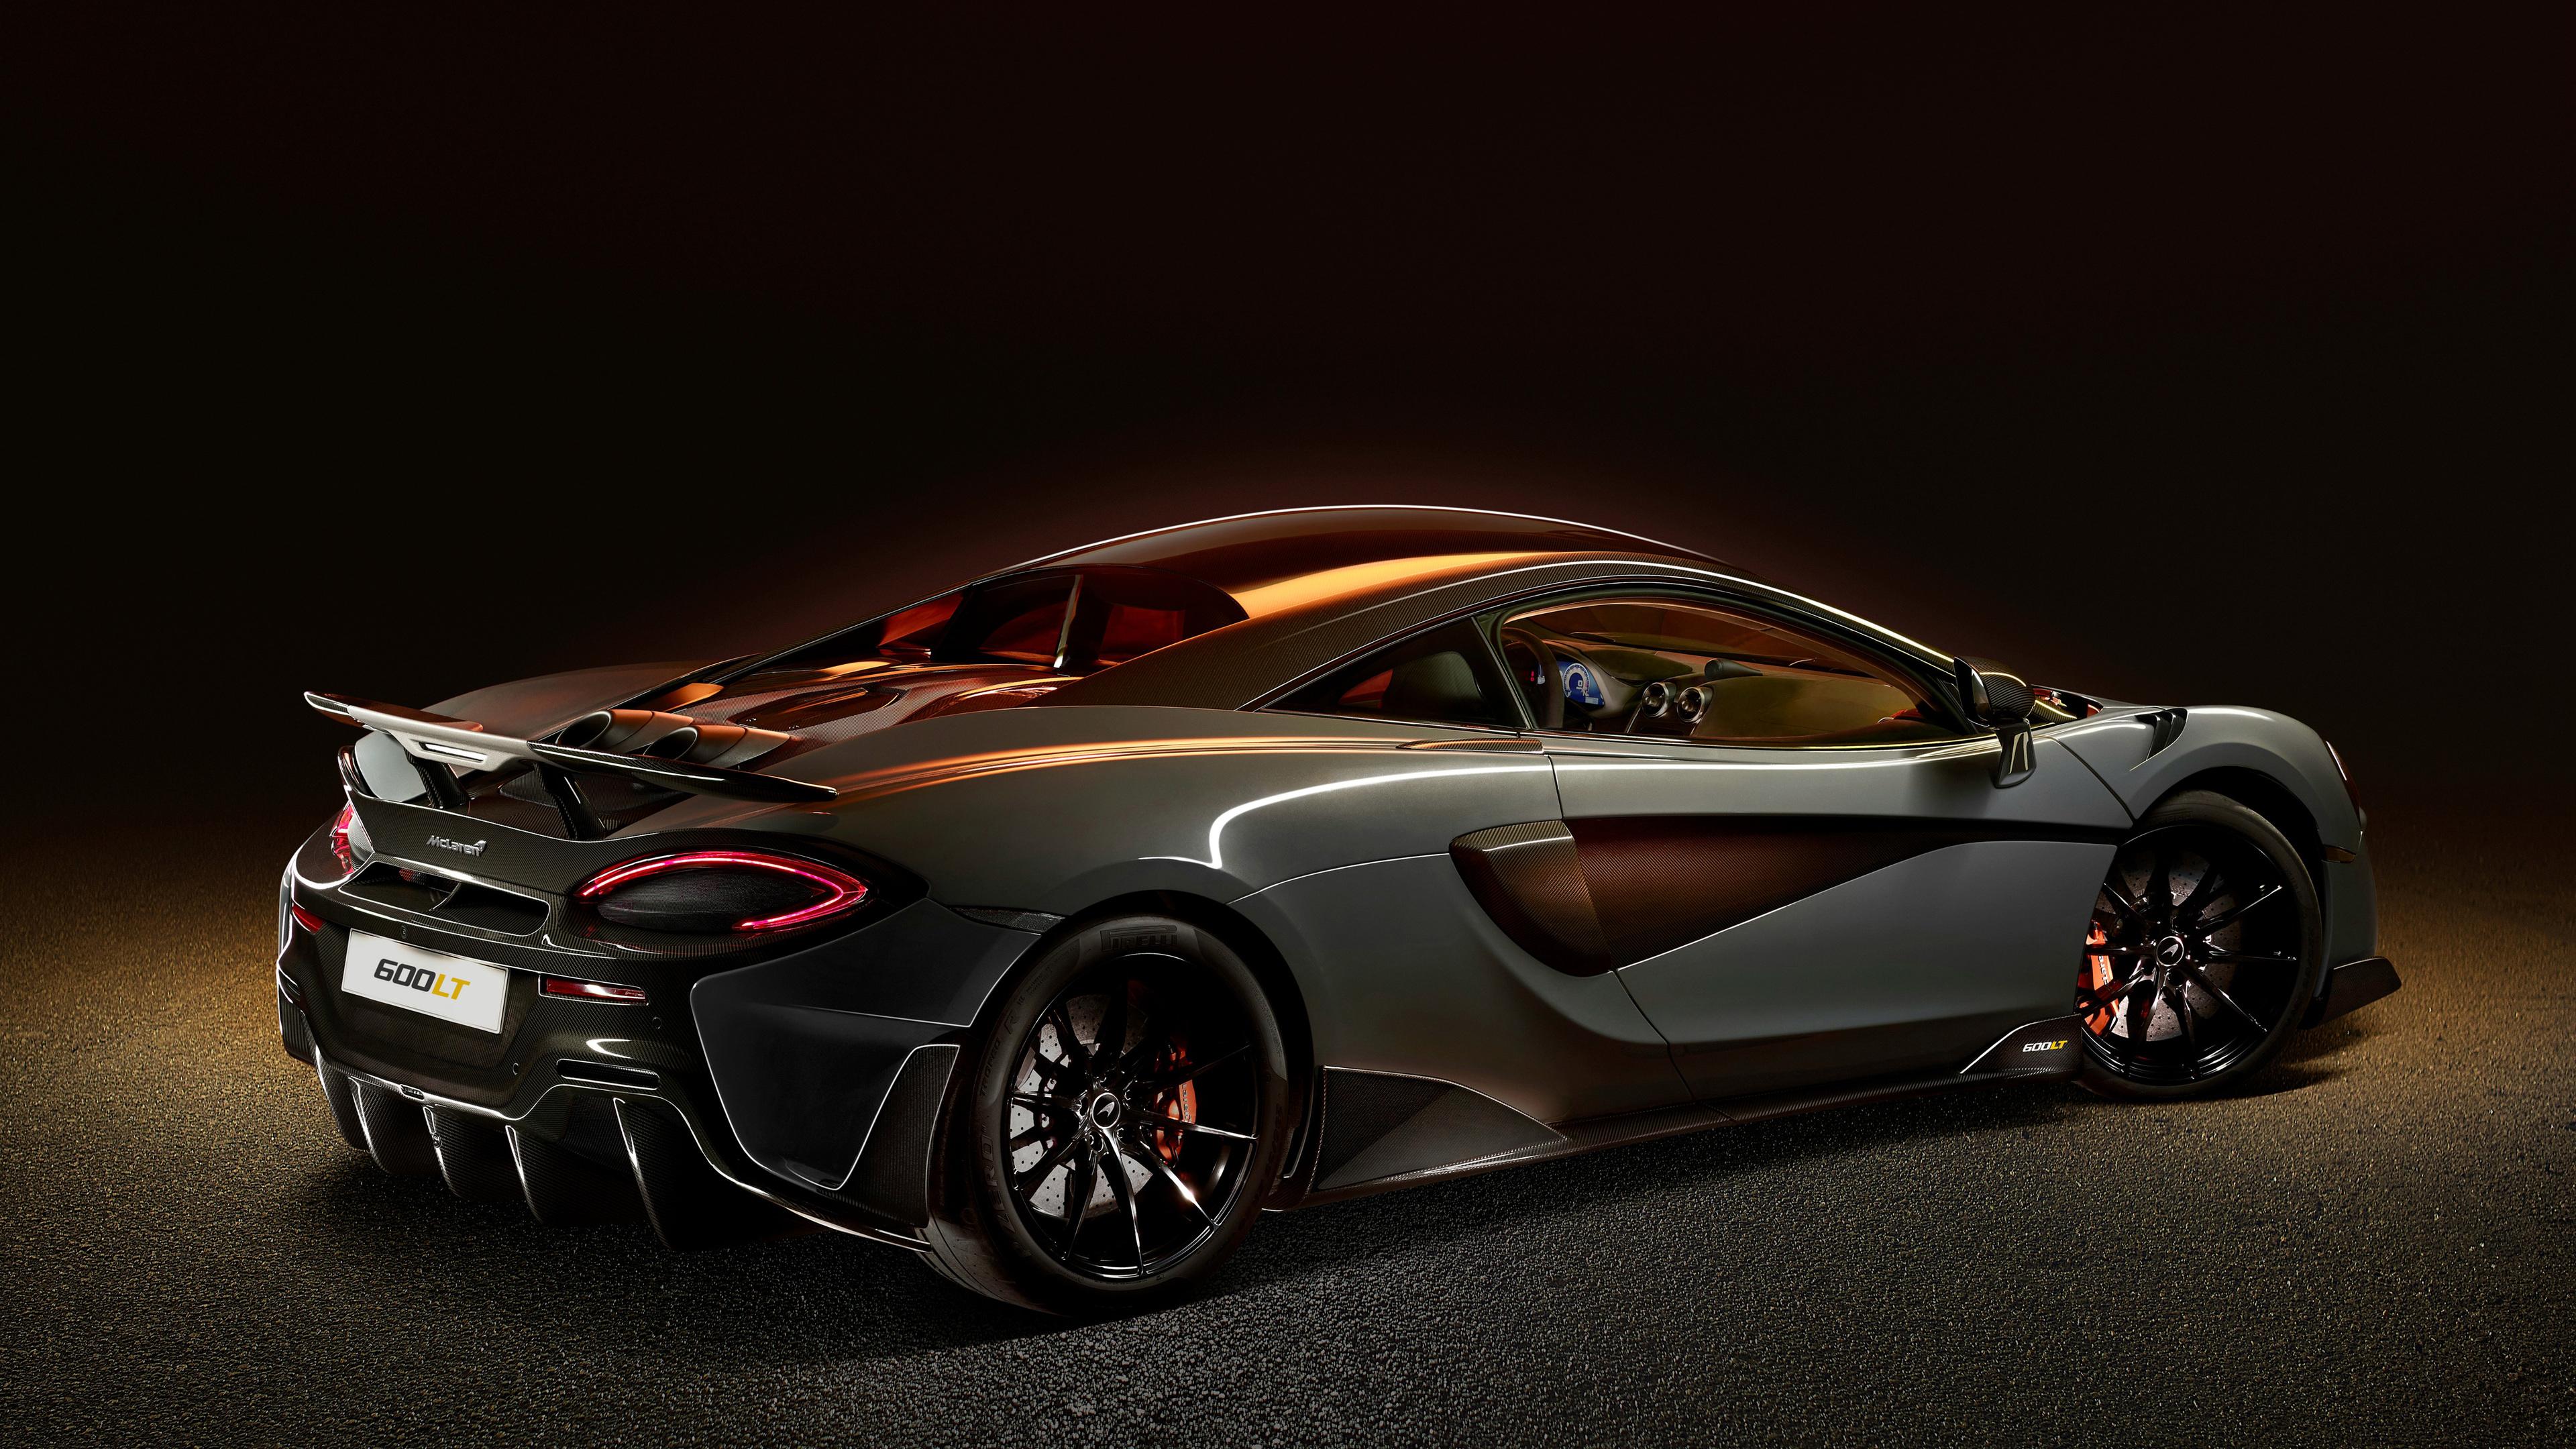 mclaren 600lt 2018 rear view 1539112059 - McLaren 600LT 2018 Rear View - mclaren wallpapers, mclaren 600lt wallpapers, hd-wallpapers, cars wallpapers, 4k-wallpapers, 2018 cars wallpapers